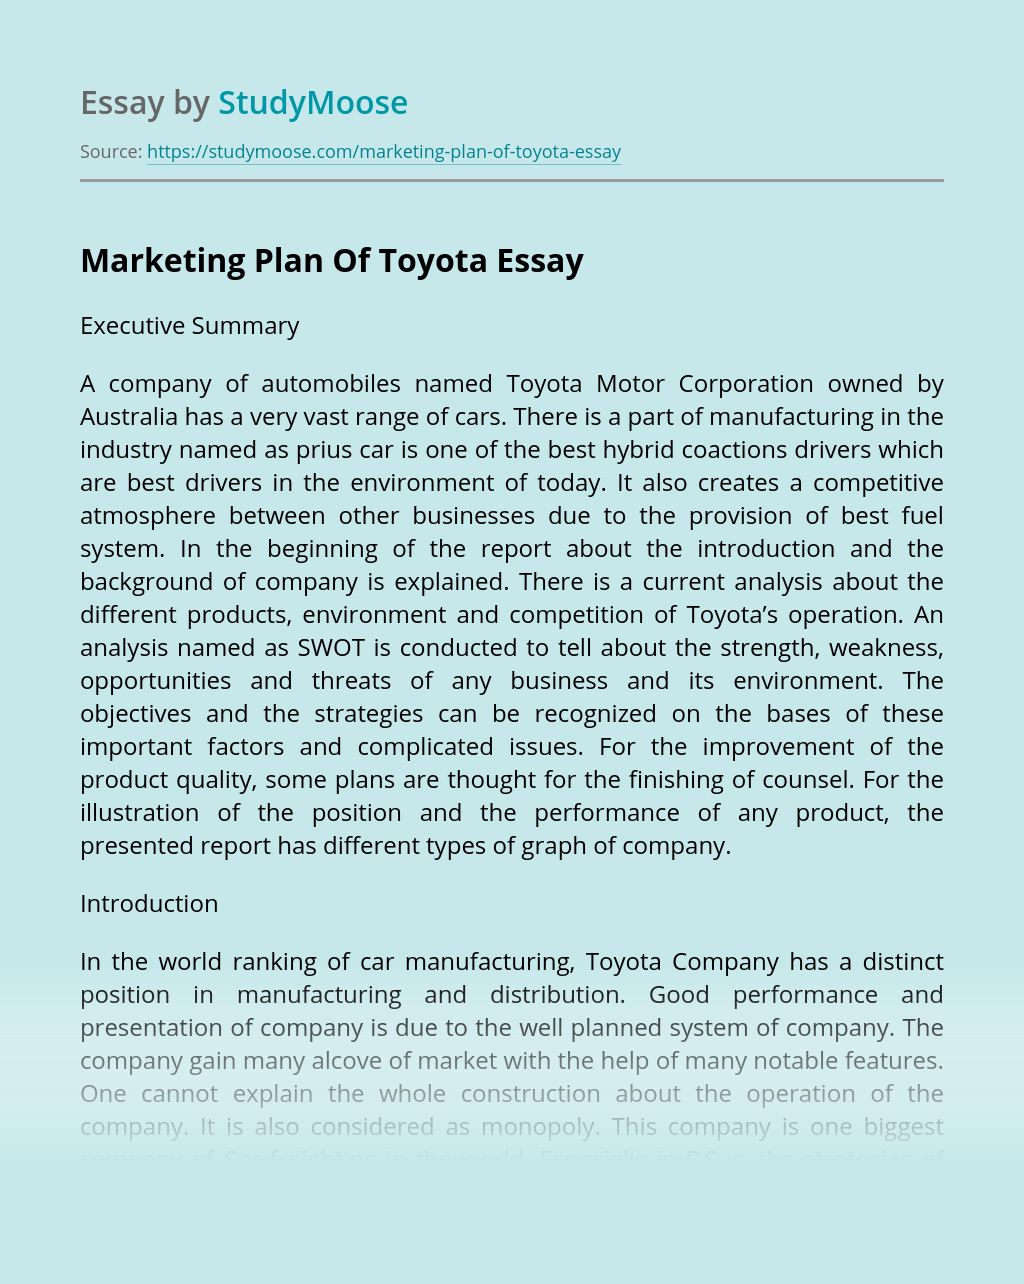 Marketing Plan Of Toyota